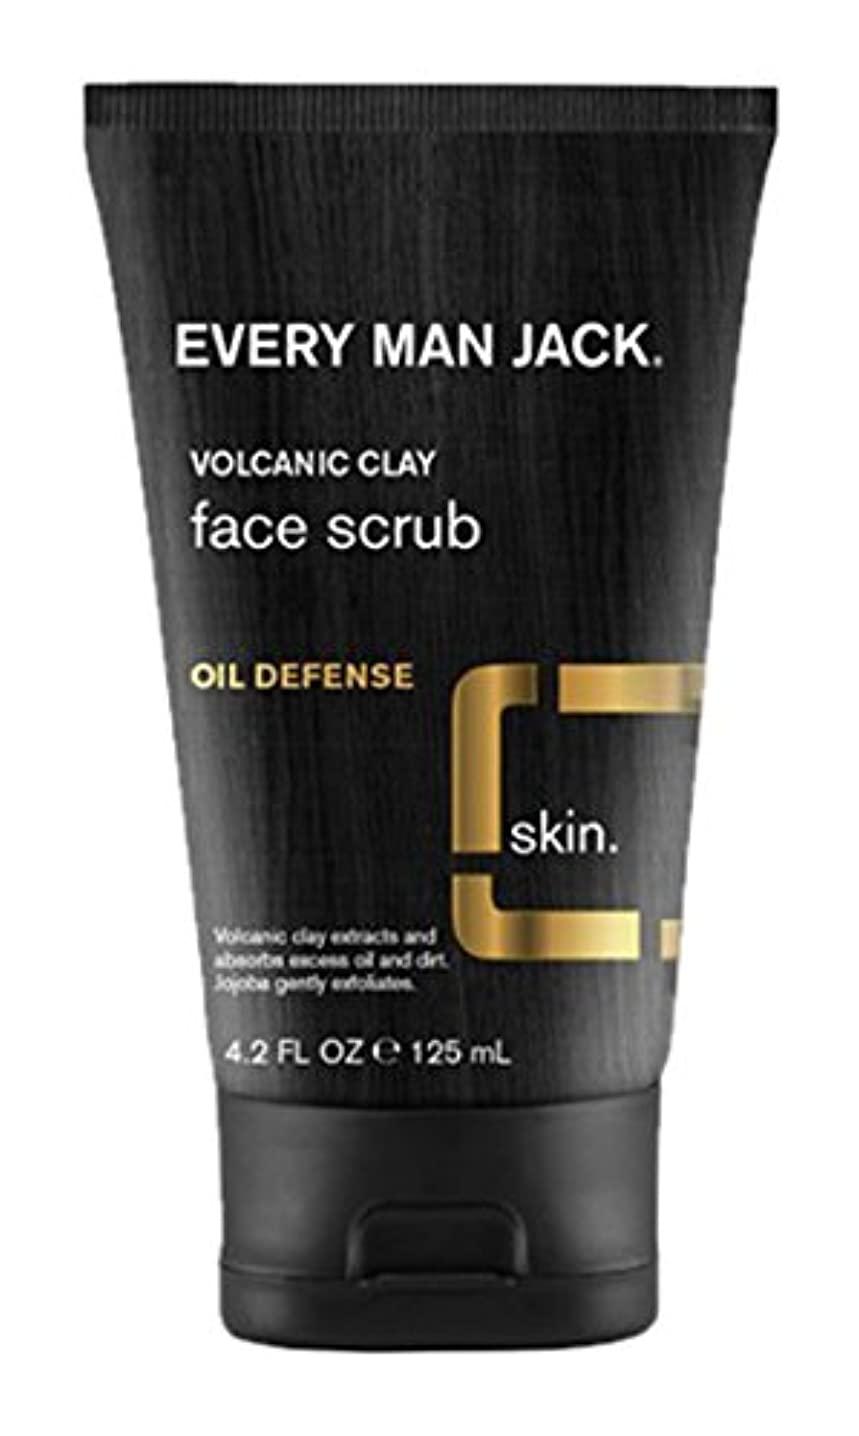 Every Man Jack Volcanic Clay Face Scrub, Oil Defense, Fragrance Free, 4.2-ounce